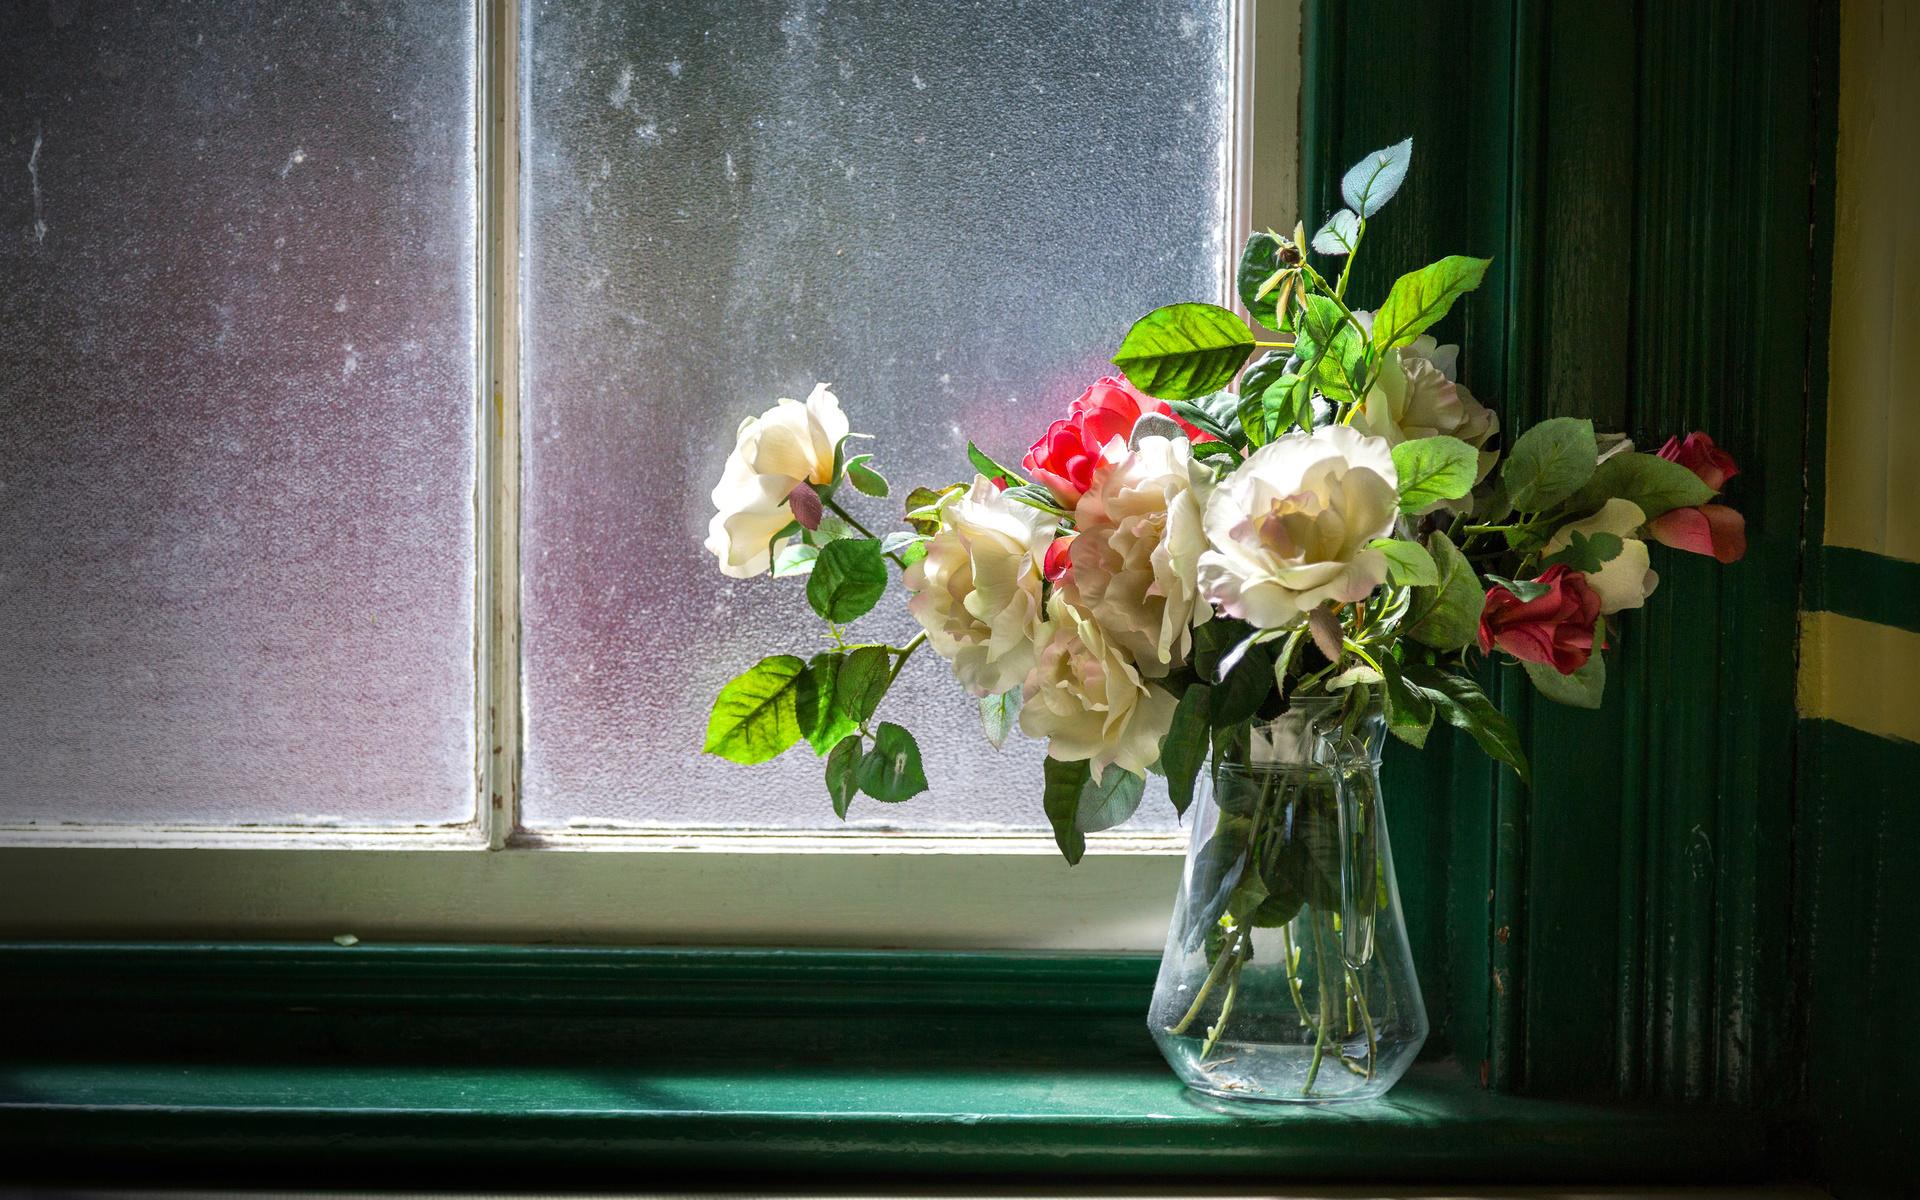 фото вино картинка роза на подоконнике представленные виде картинок